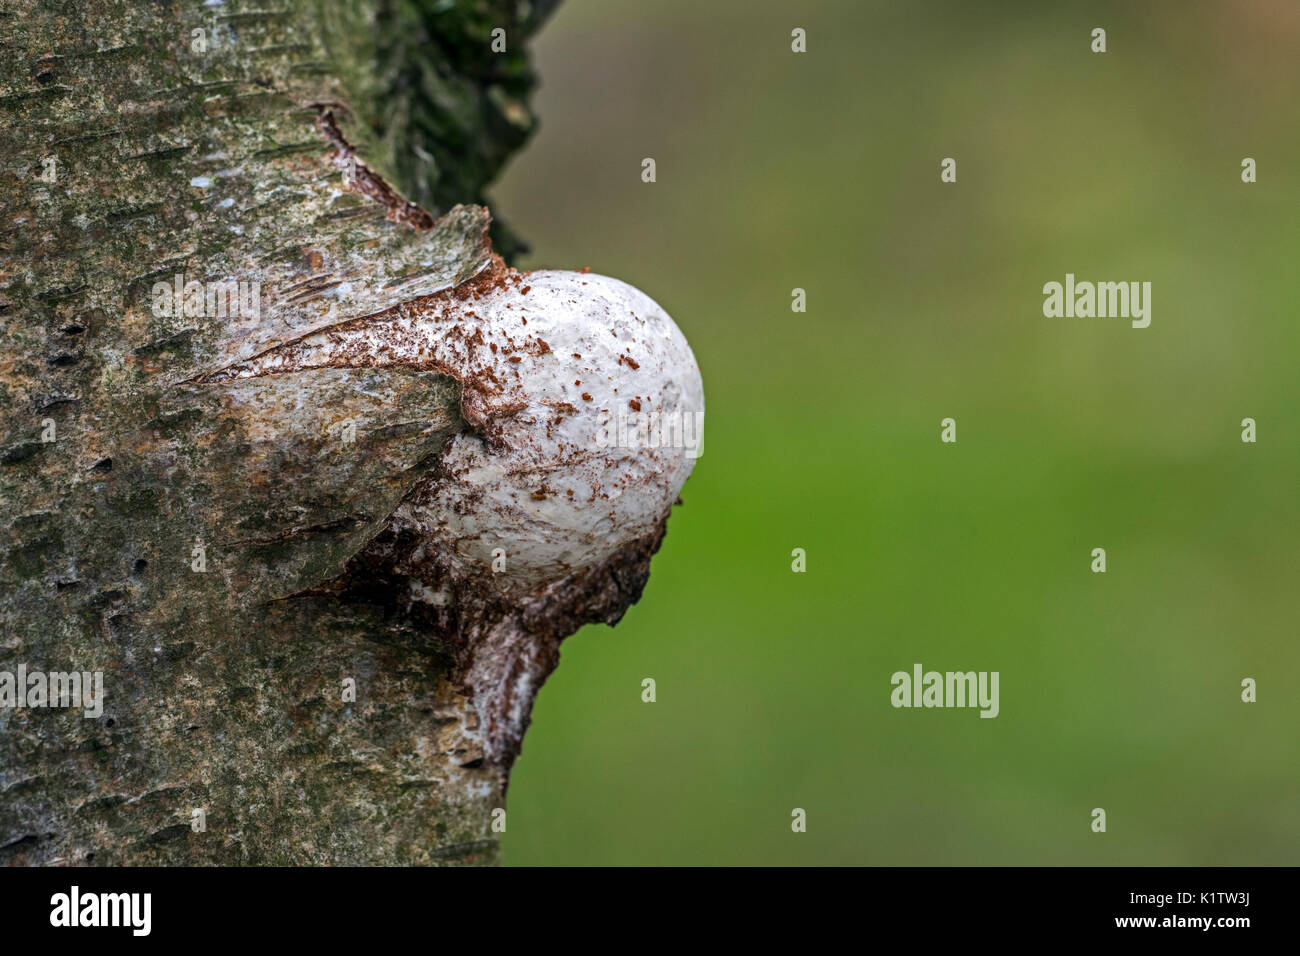 Emerging fruiting body / basidiocarp of birch polypore / birch bracket / razor strop (Piptoporus betulinus) bursting through birch tree bark - Stock Image